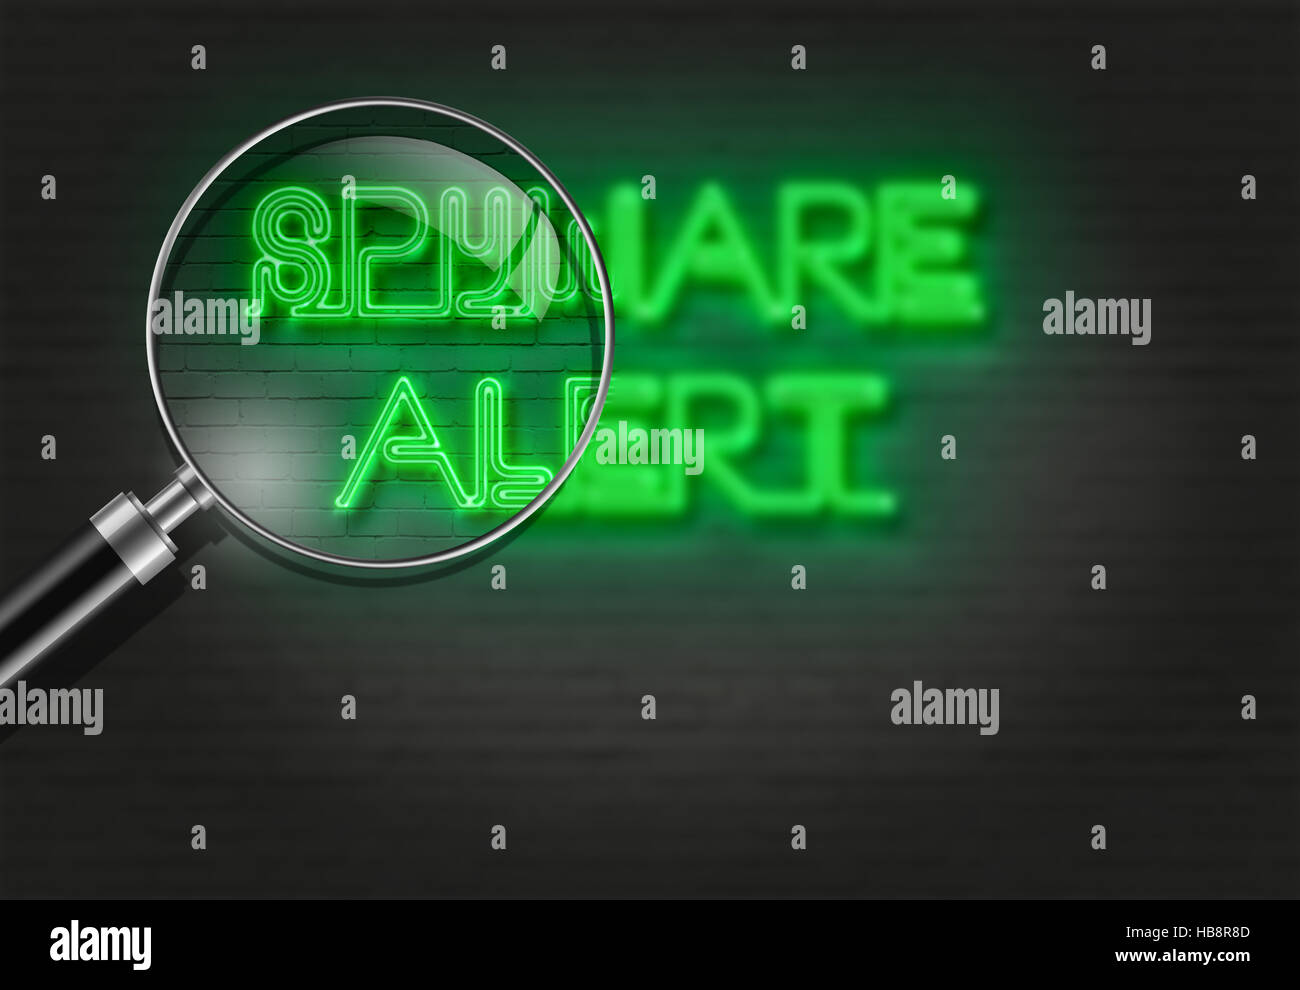 SPYWARE ALERT - Stock Image